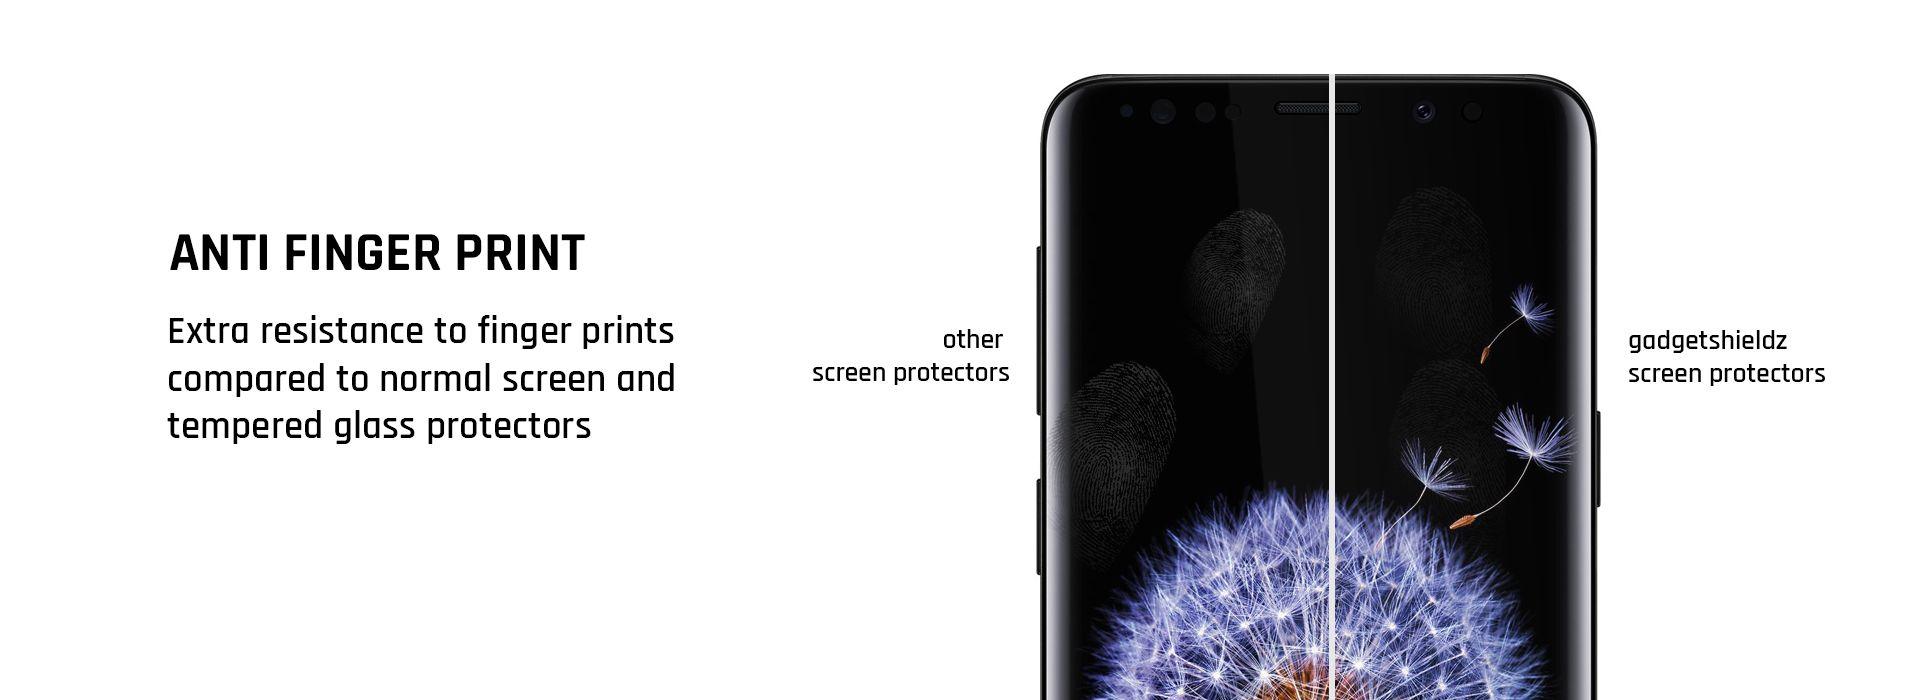 Anti-fingerprint